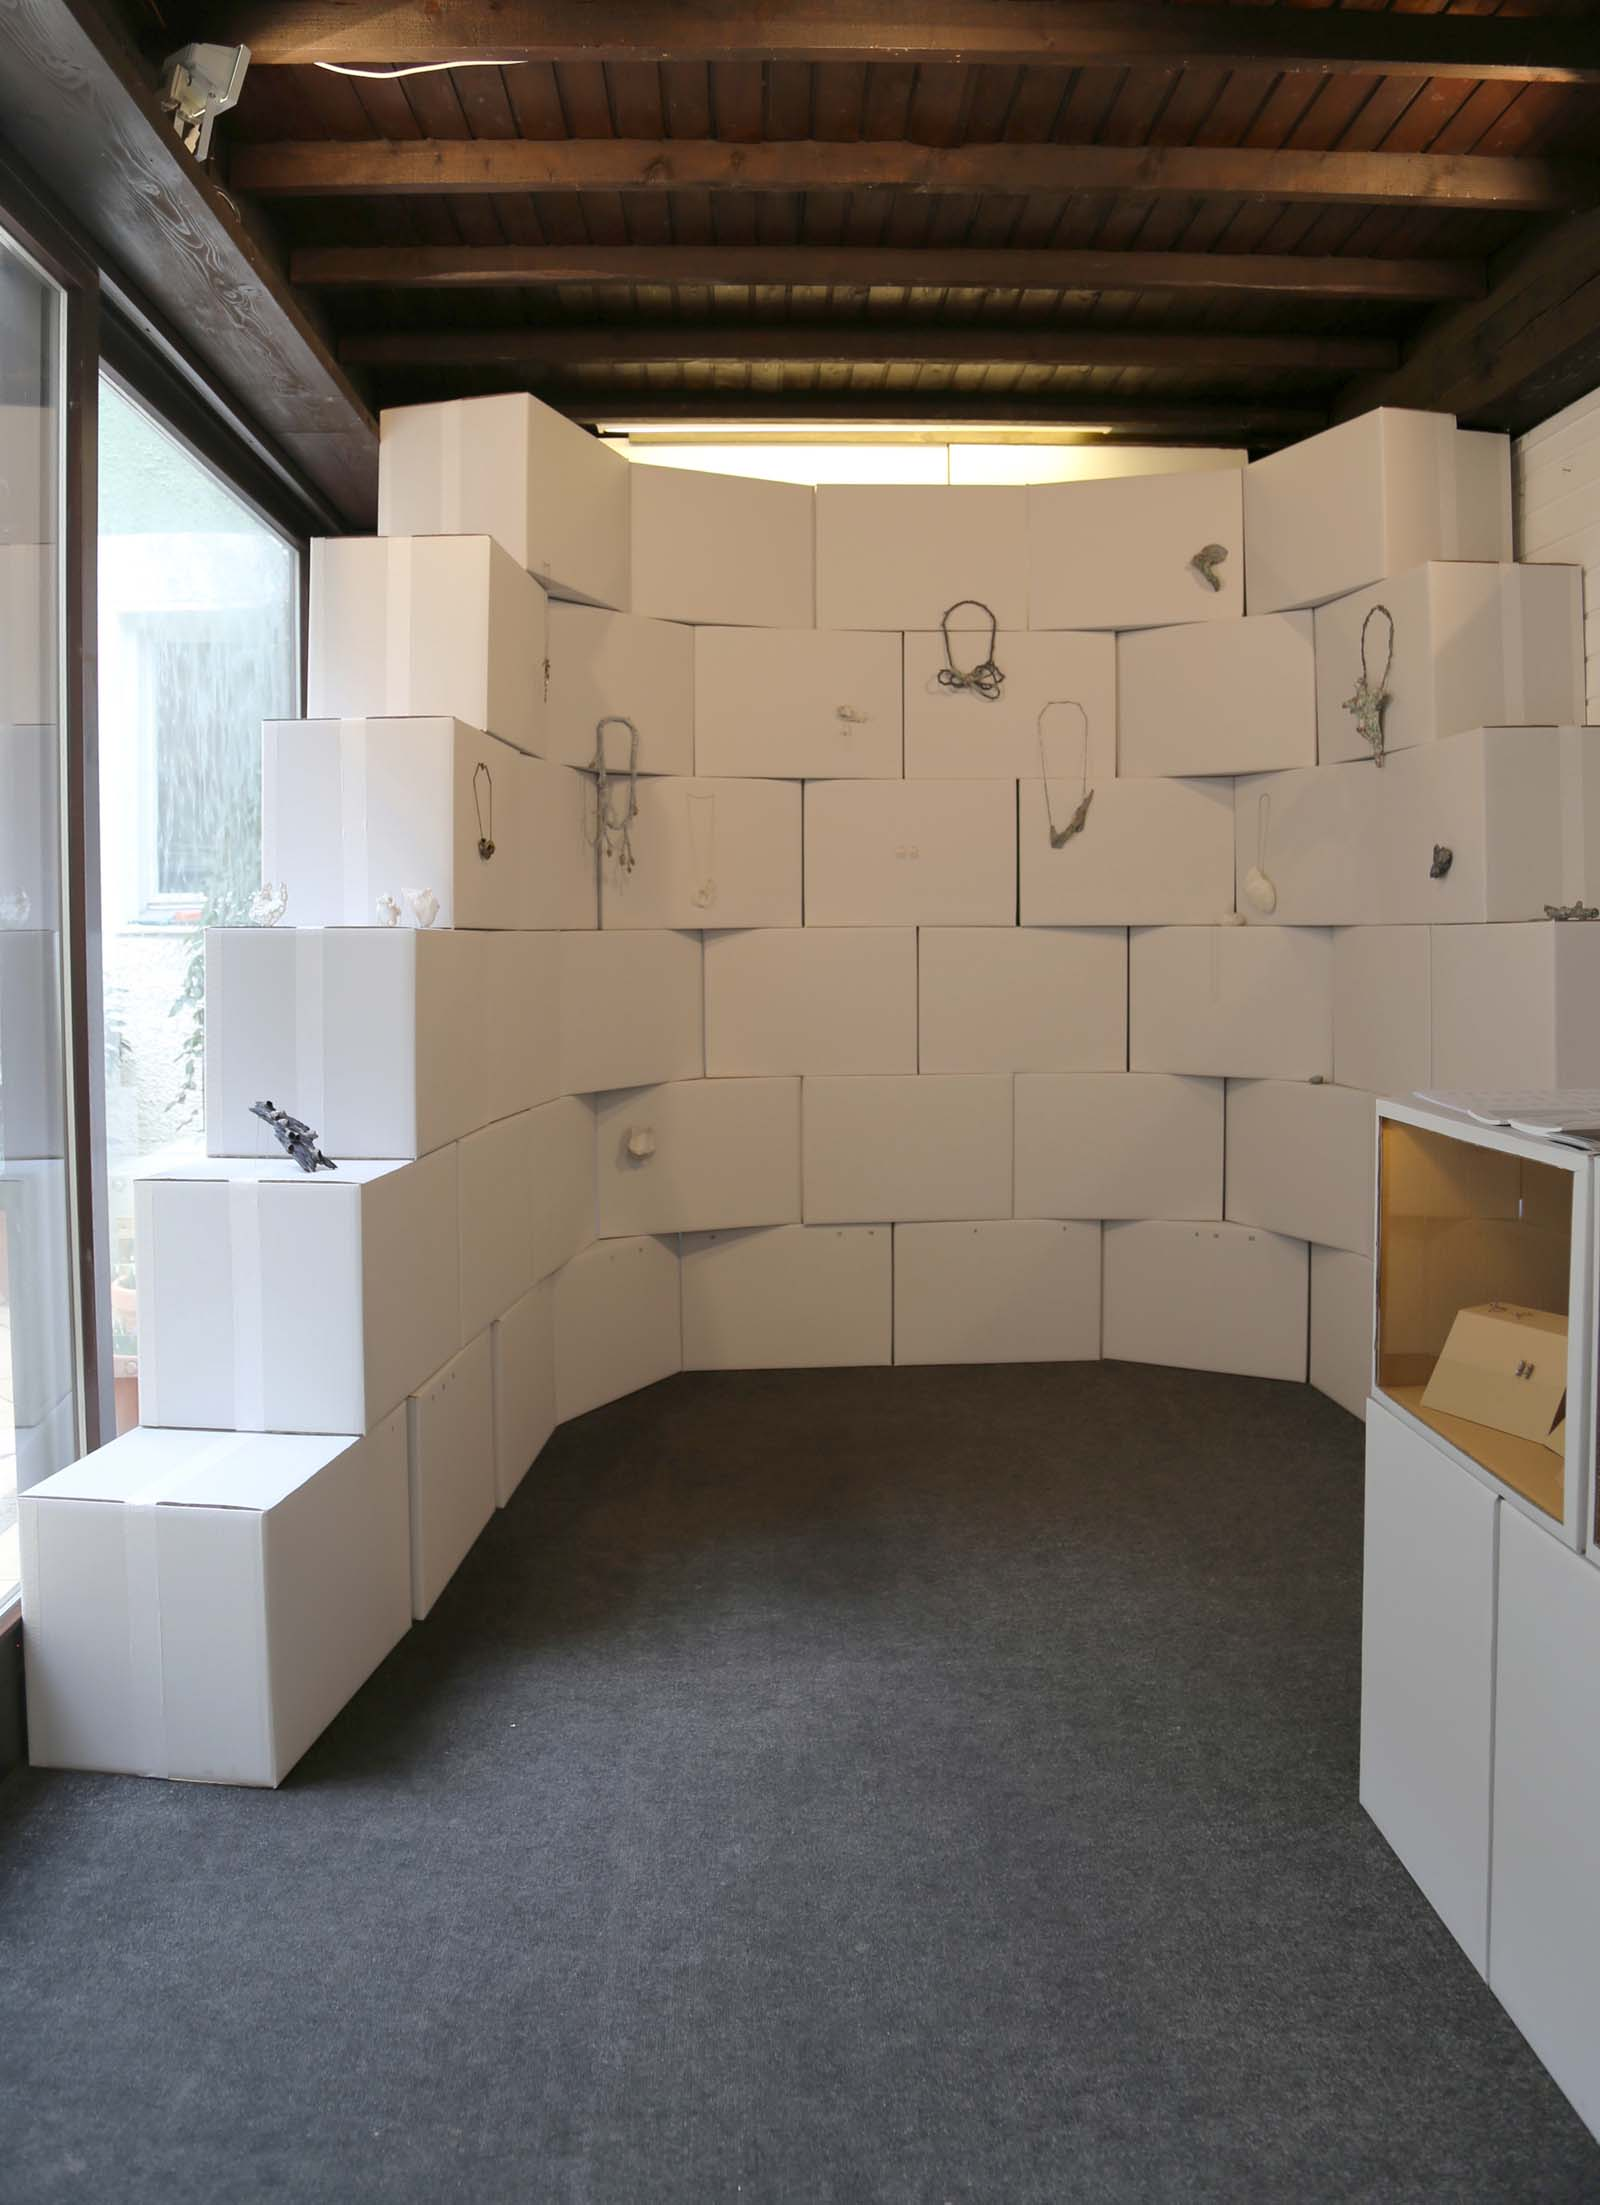 """Microphilia"" I A duo exhibition of Annamaria Leiste and Carina Shoshtary I 2015 I Studio Gierke-Berr, Munich, Germany I Photo: Carina Shoshtary"